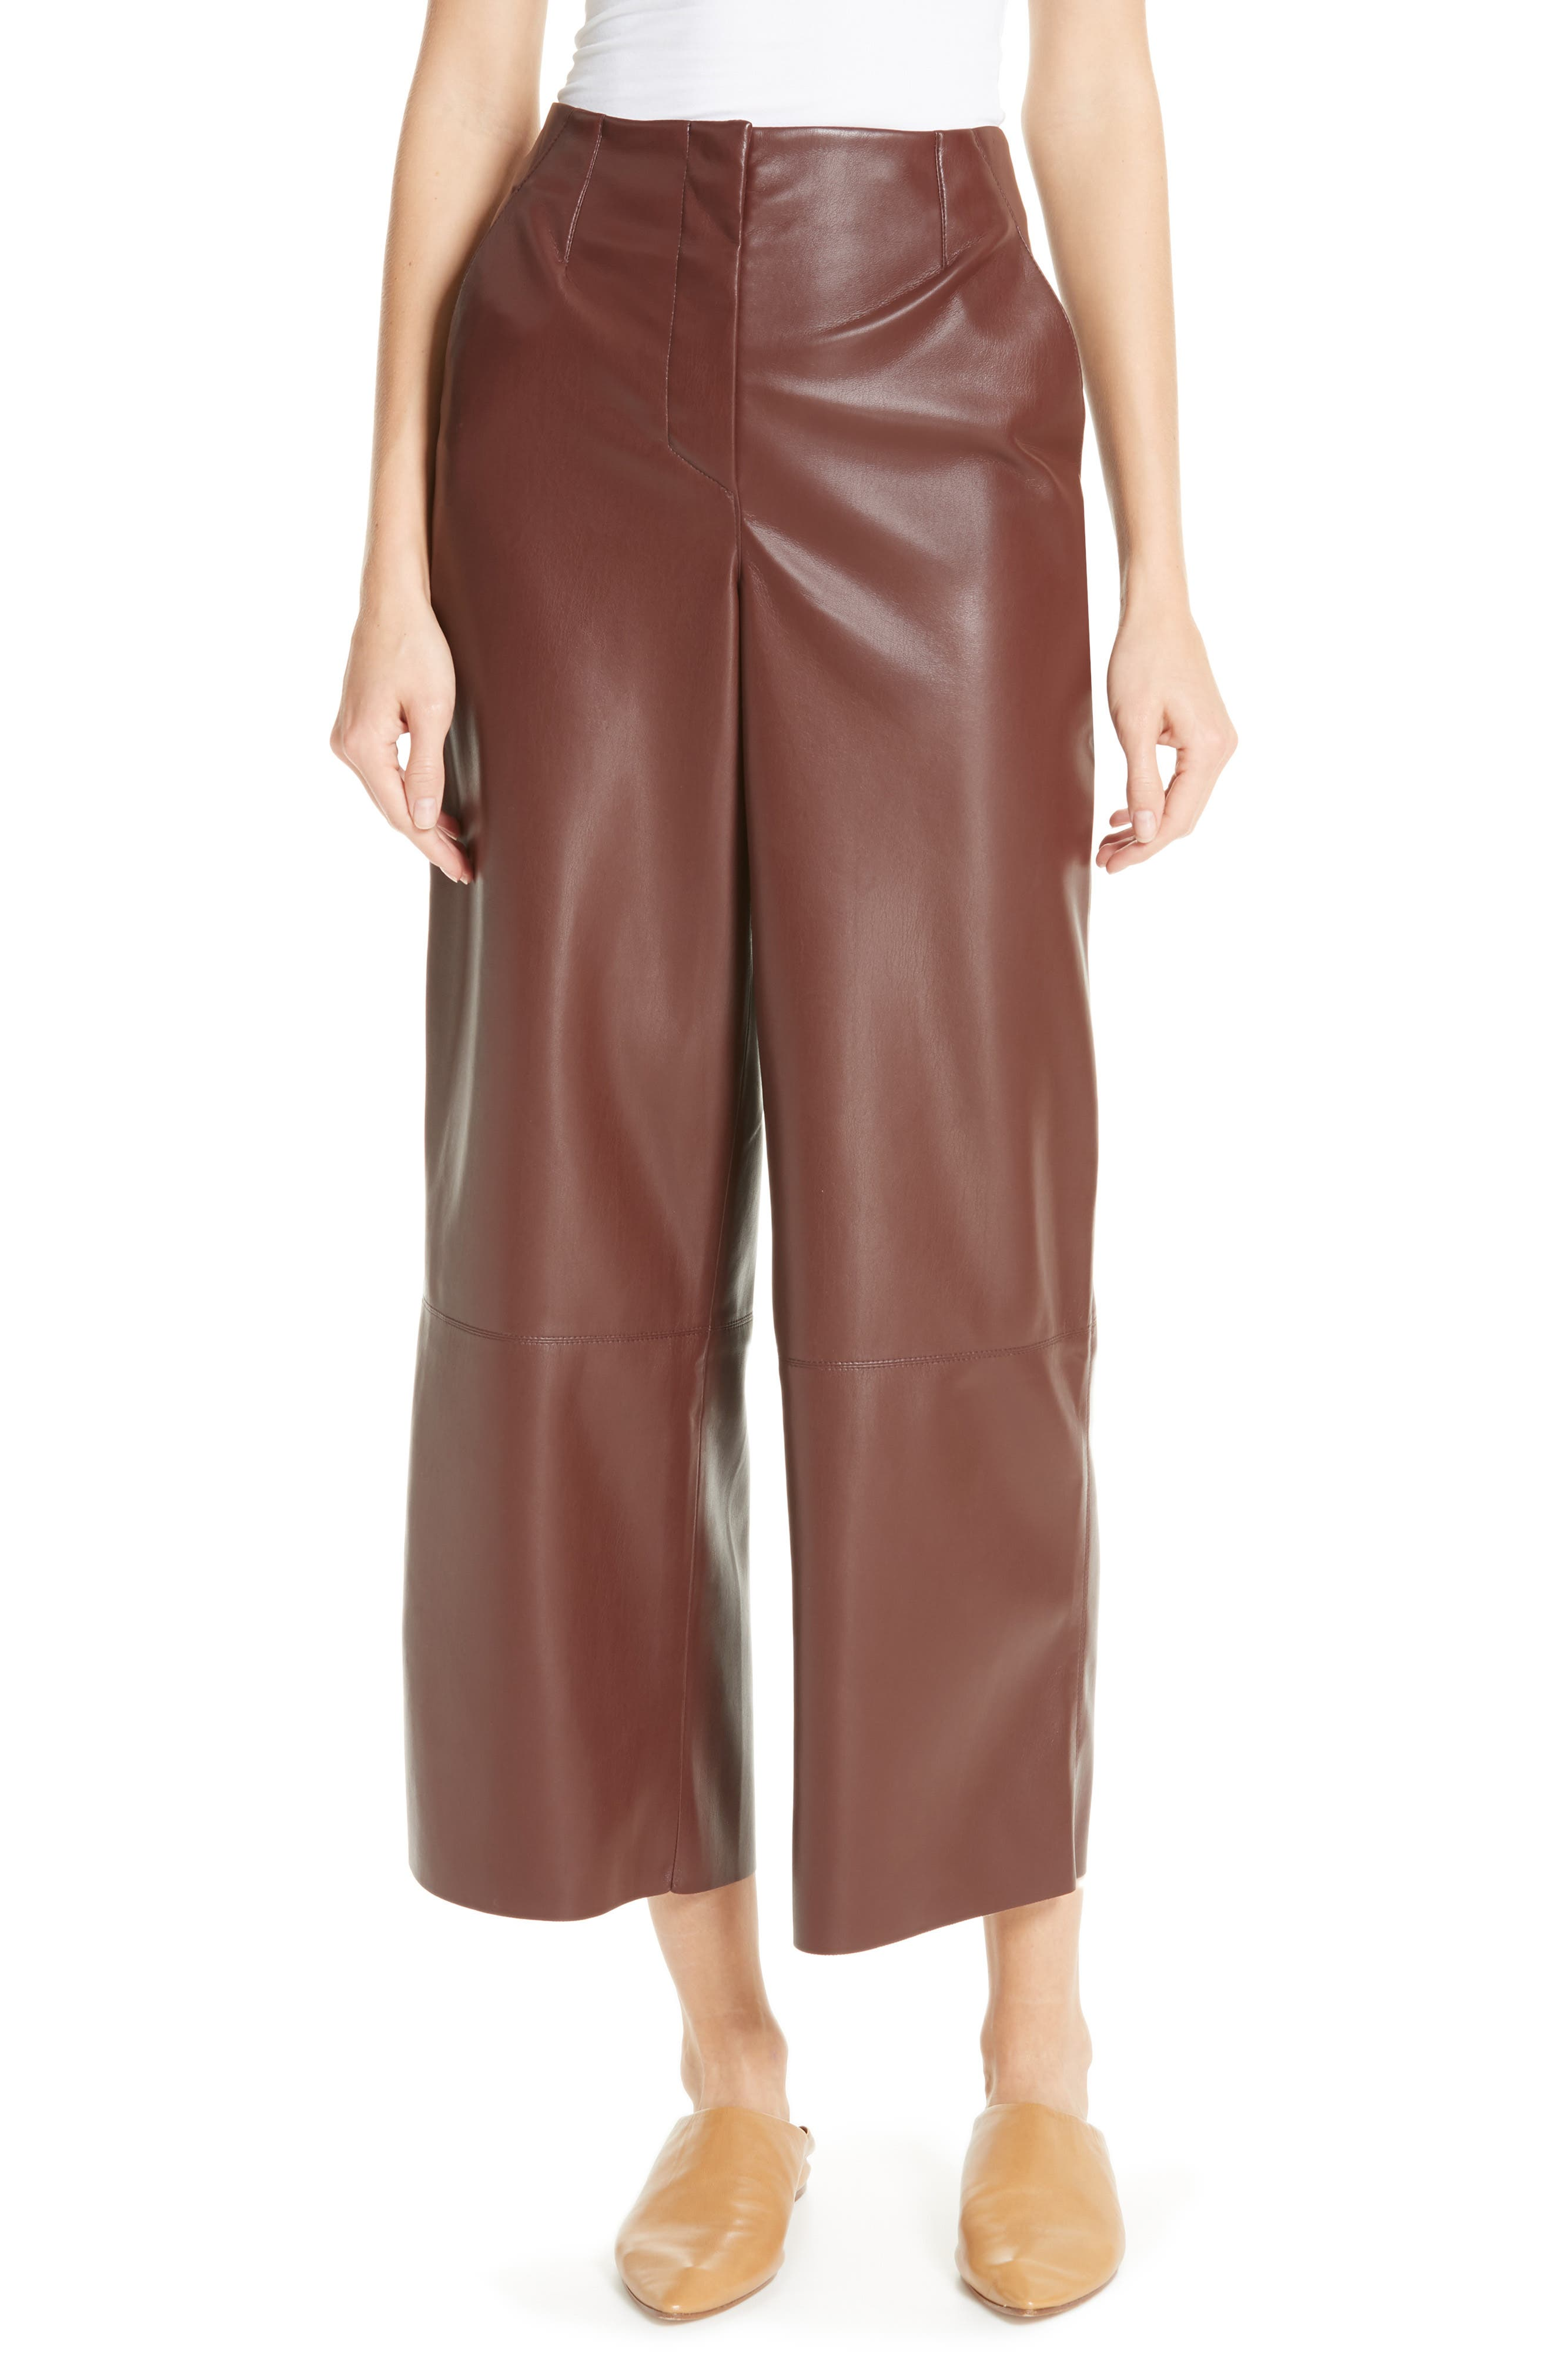 Africa Faux Leather Wide Leg Crop Pants,                         Main,                         color, 509